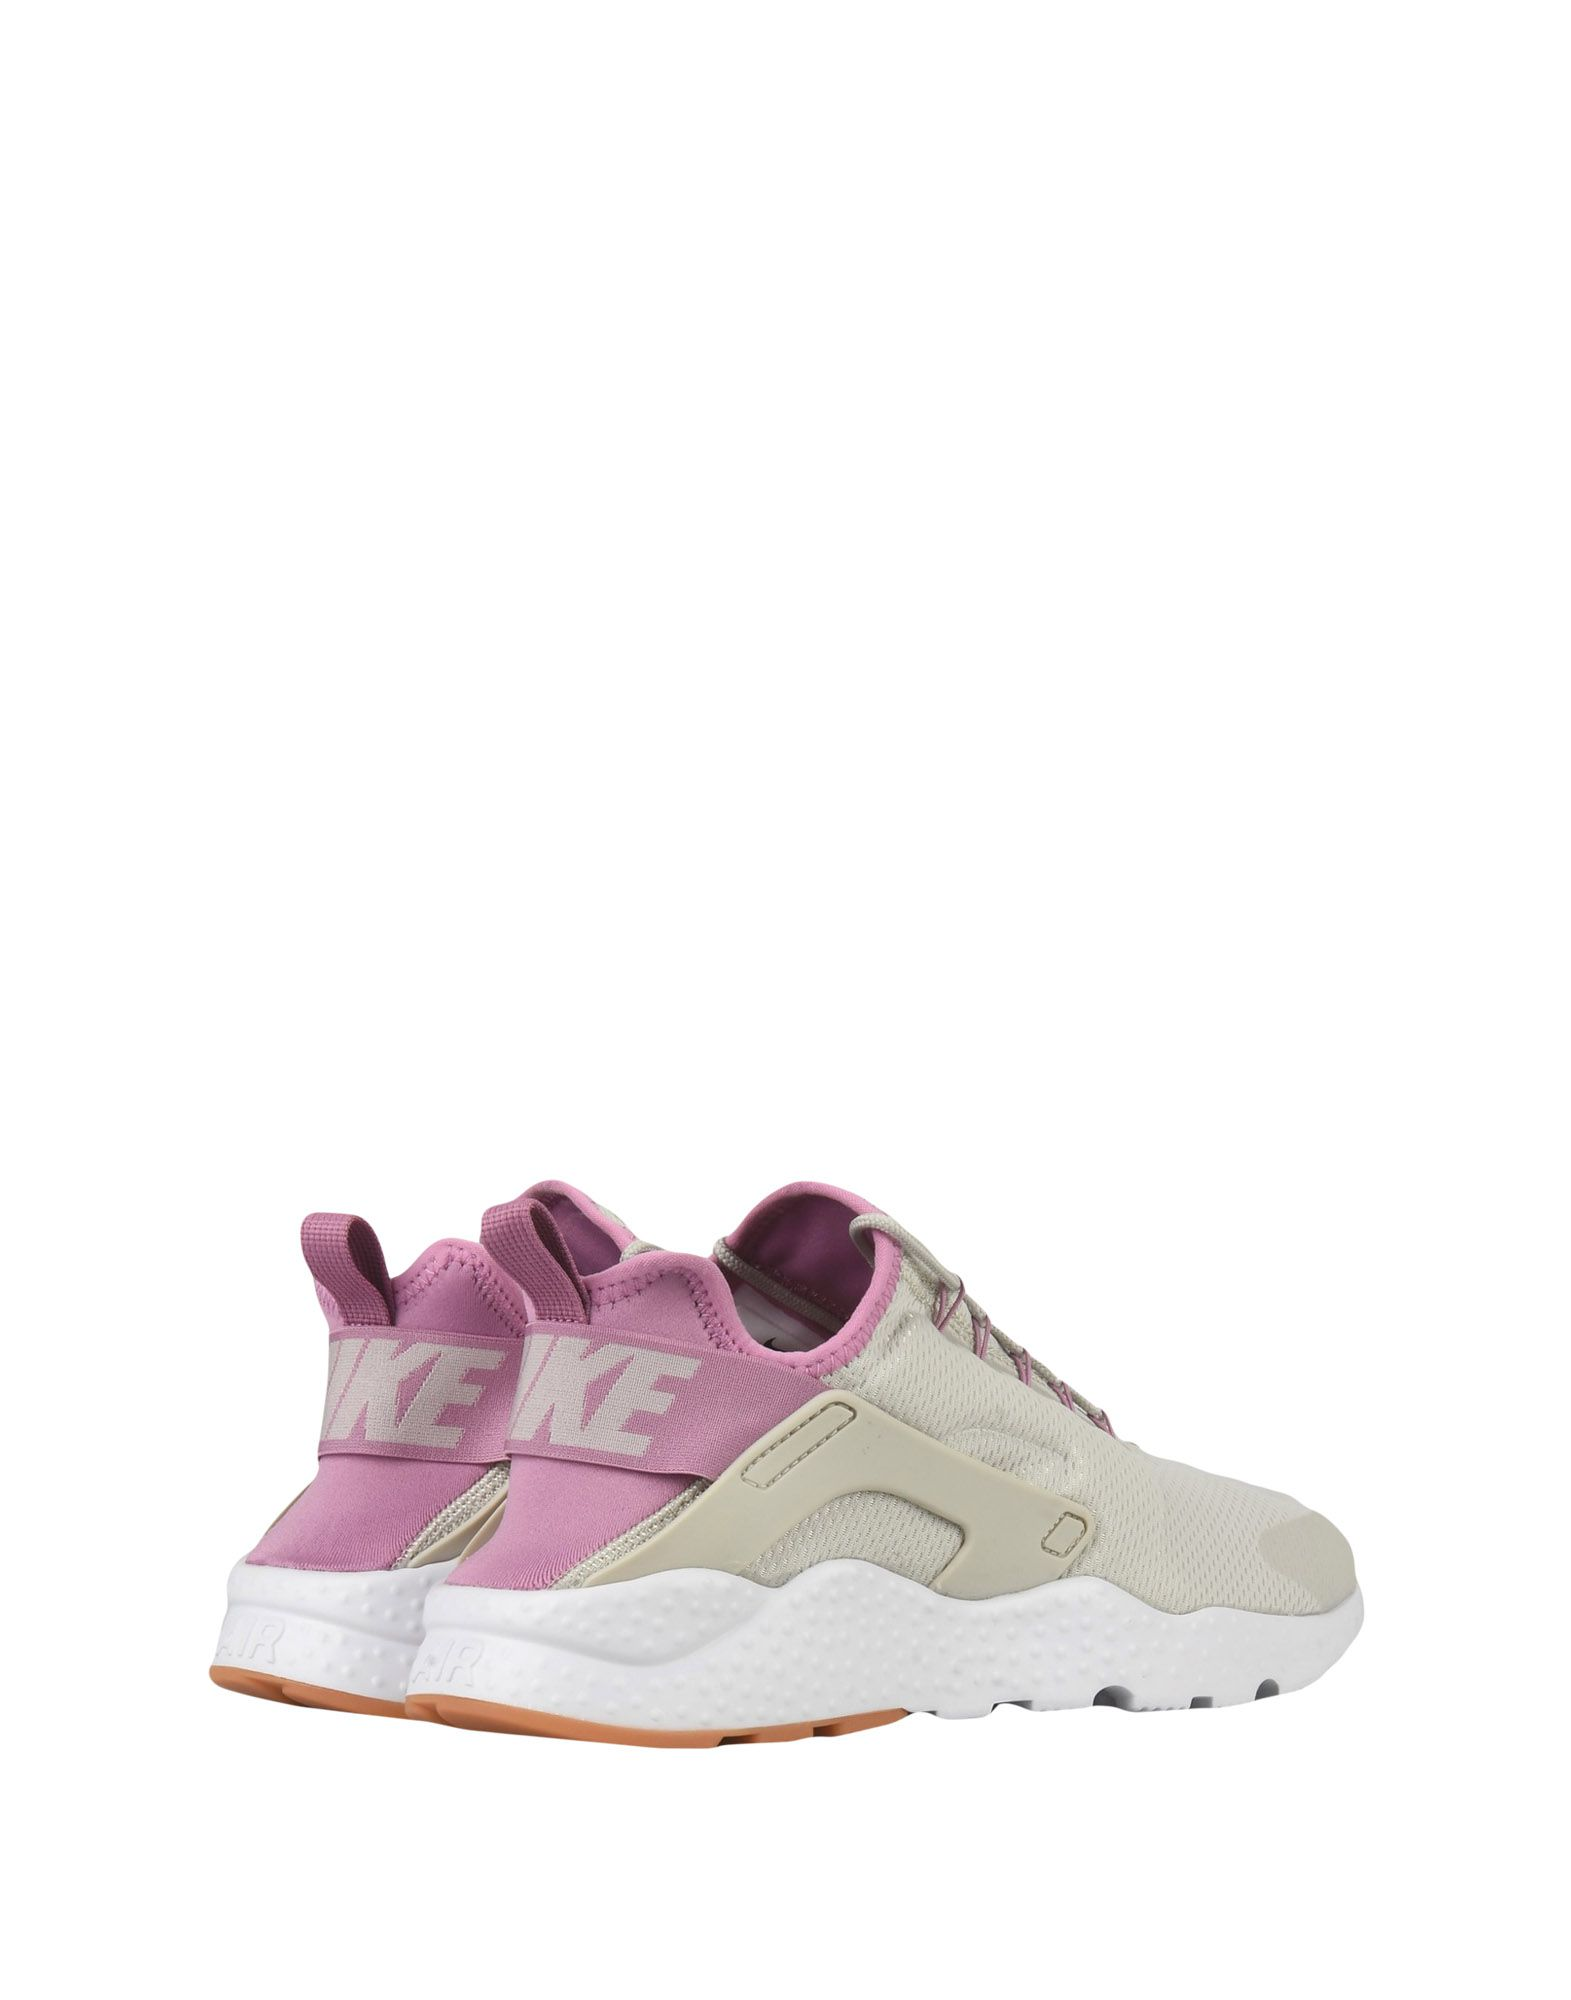 Sneakers Nike  Air Huarache Run Ultra - Femme - Sneakers Nike sur